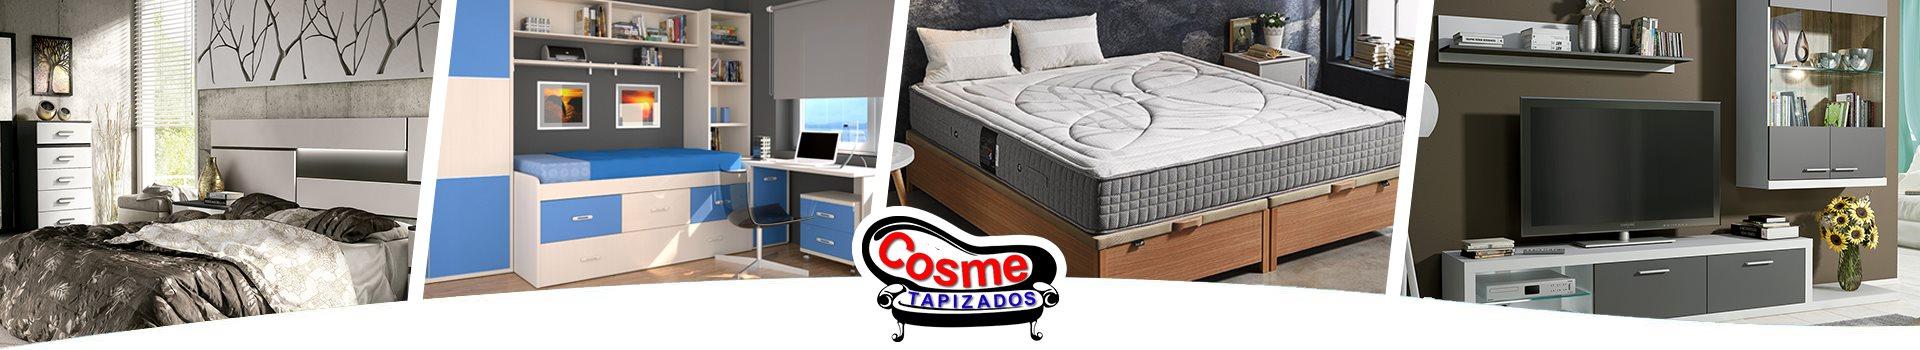 SILLONES RELAX EN VEGA BAJA, Sofá cama ,sofá en Almoradí , sofá modular, sofá rinconera , sofá de di